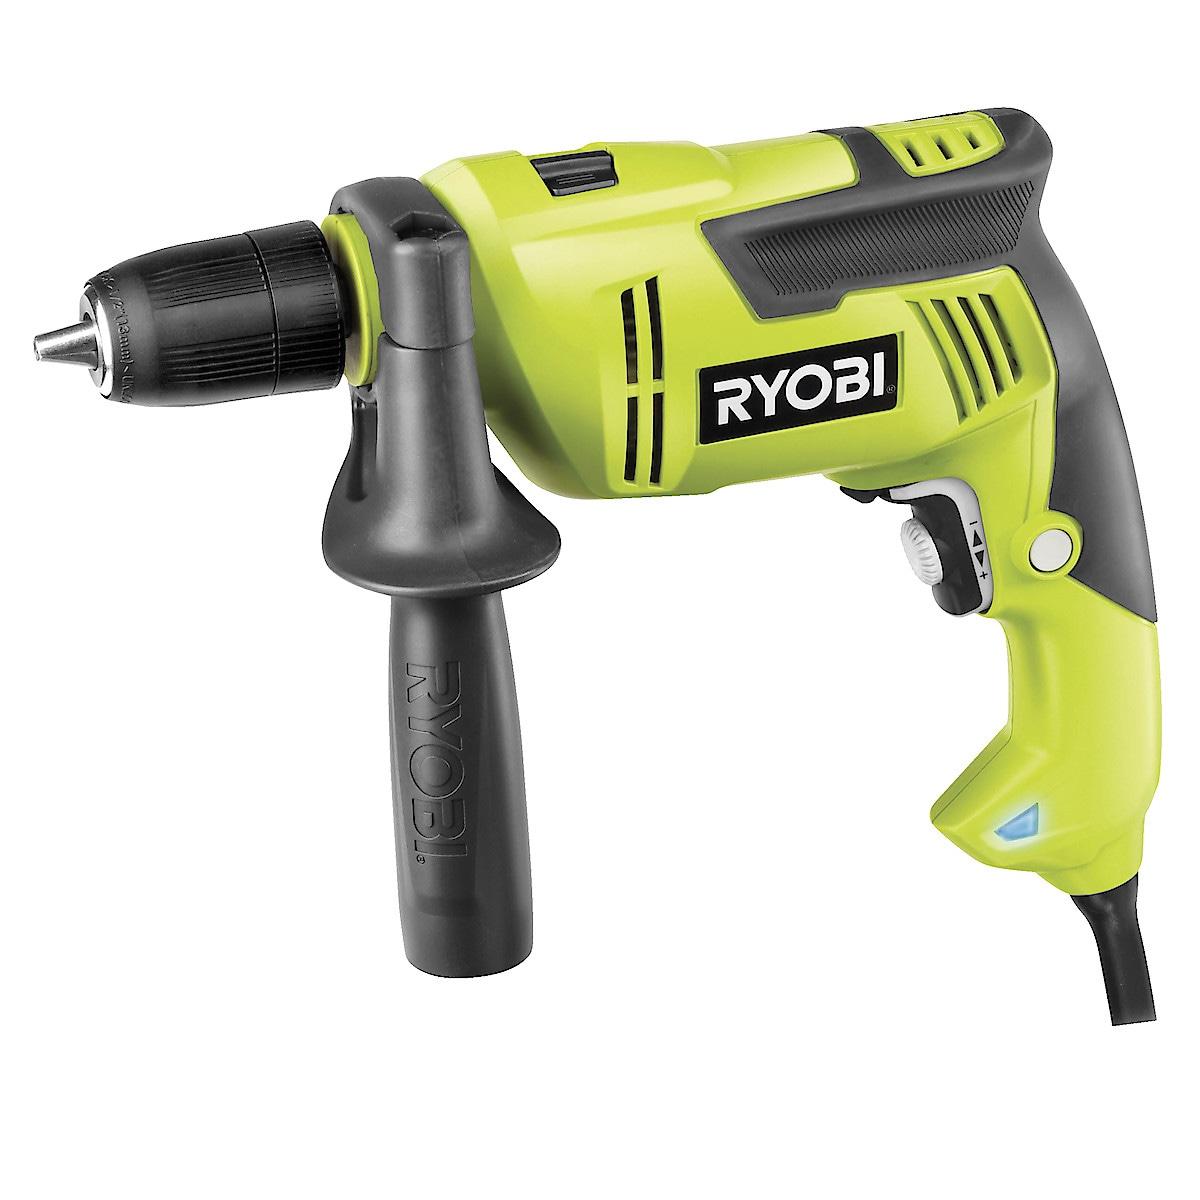 Ryobi EID-500RE Hammer Drill